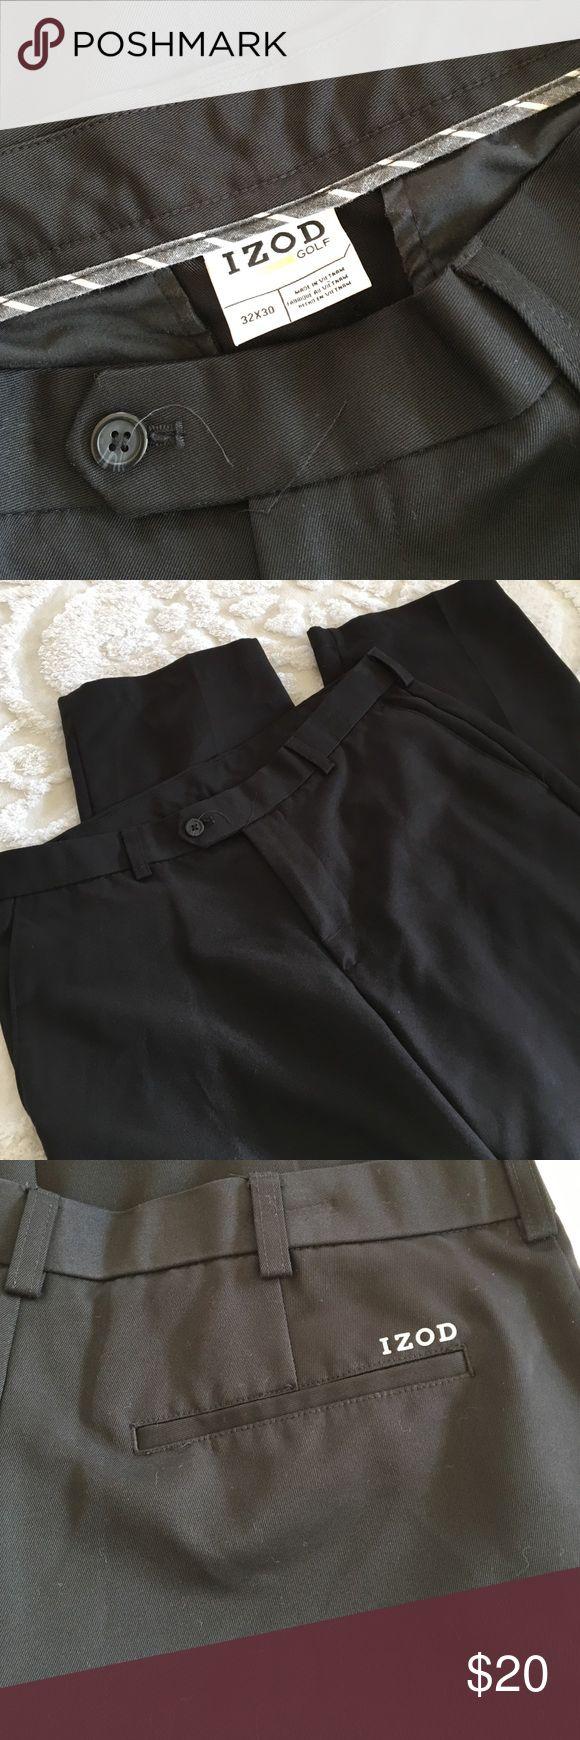 Brand New Men's Izod Golf Pants 32X30 Black lightweight men's golf pants Izod Golf Pants Dress